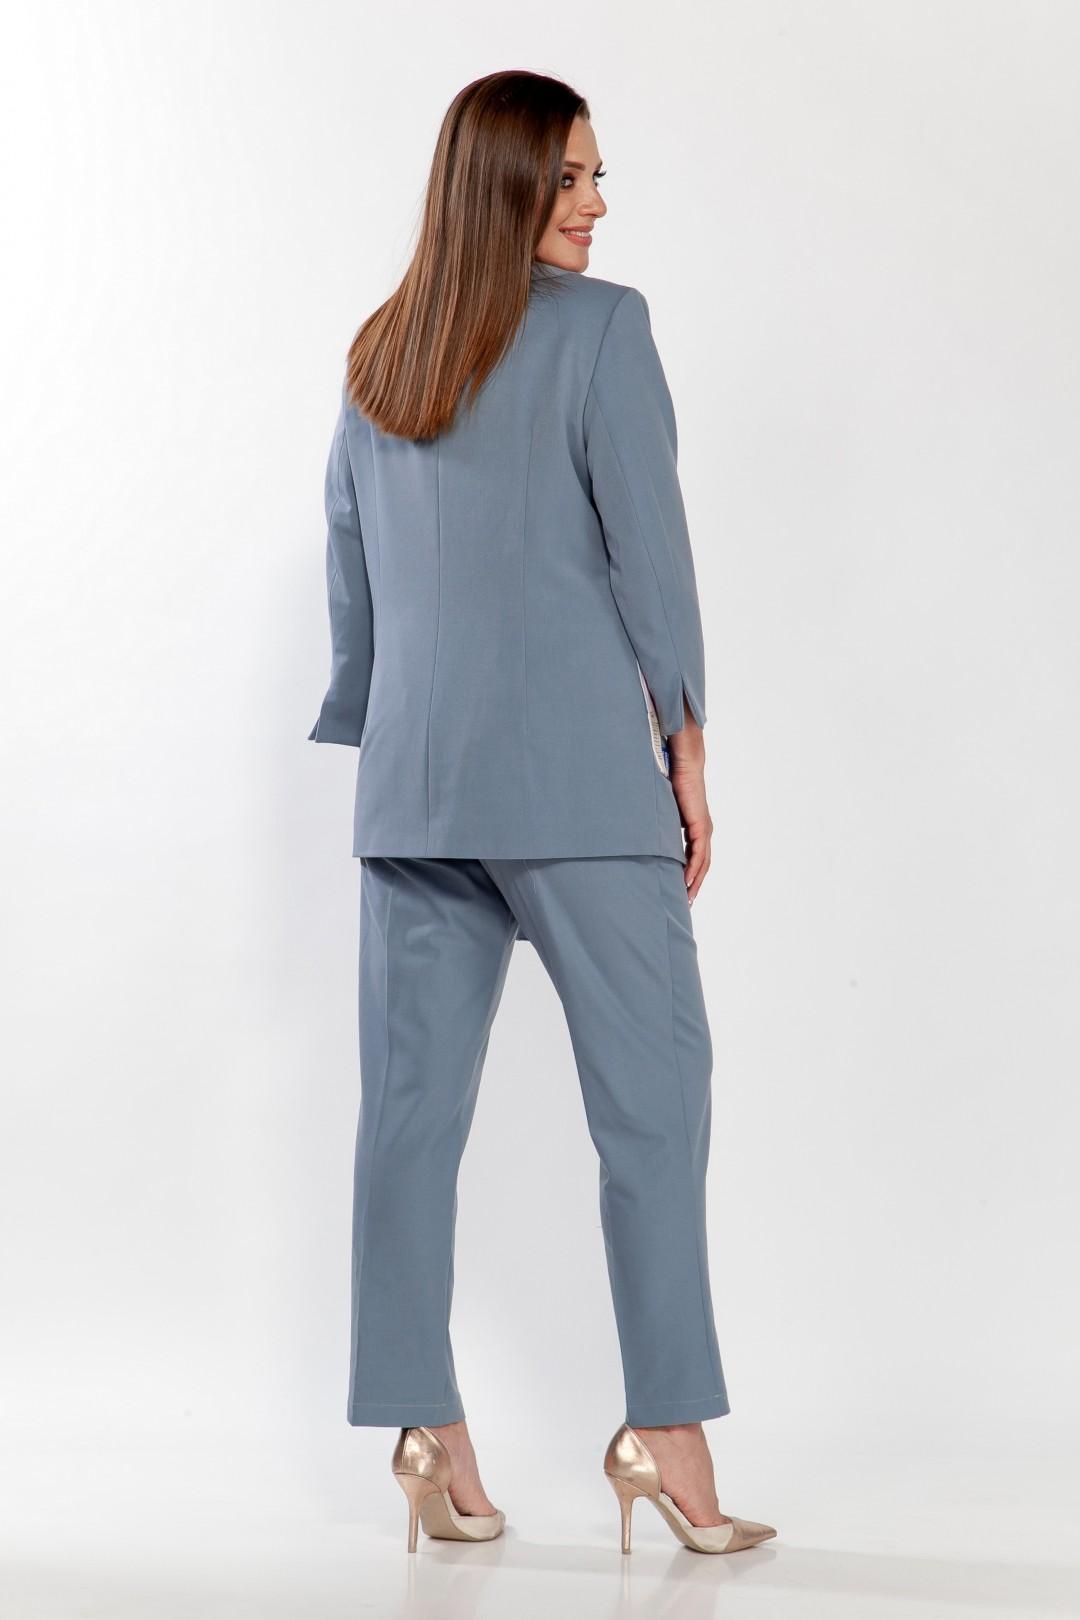 Жакет Belinga 5115 серо-голубой